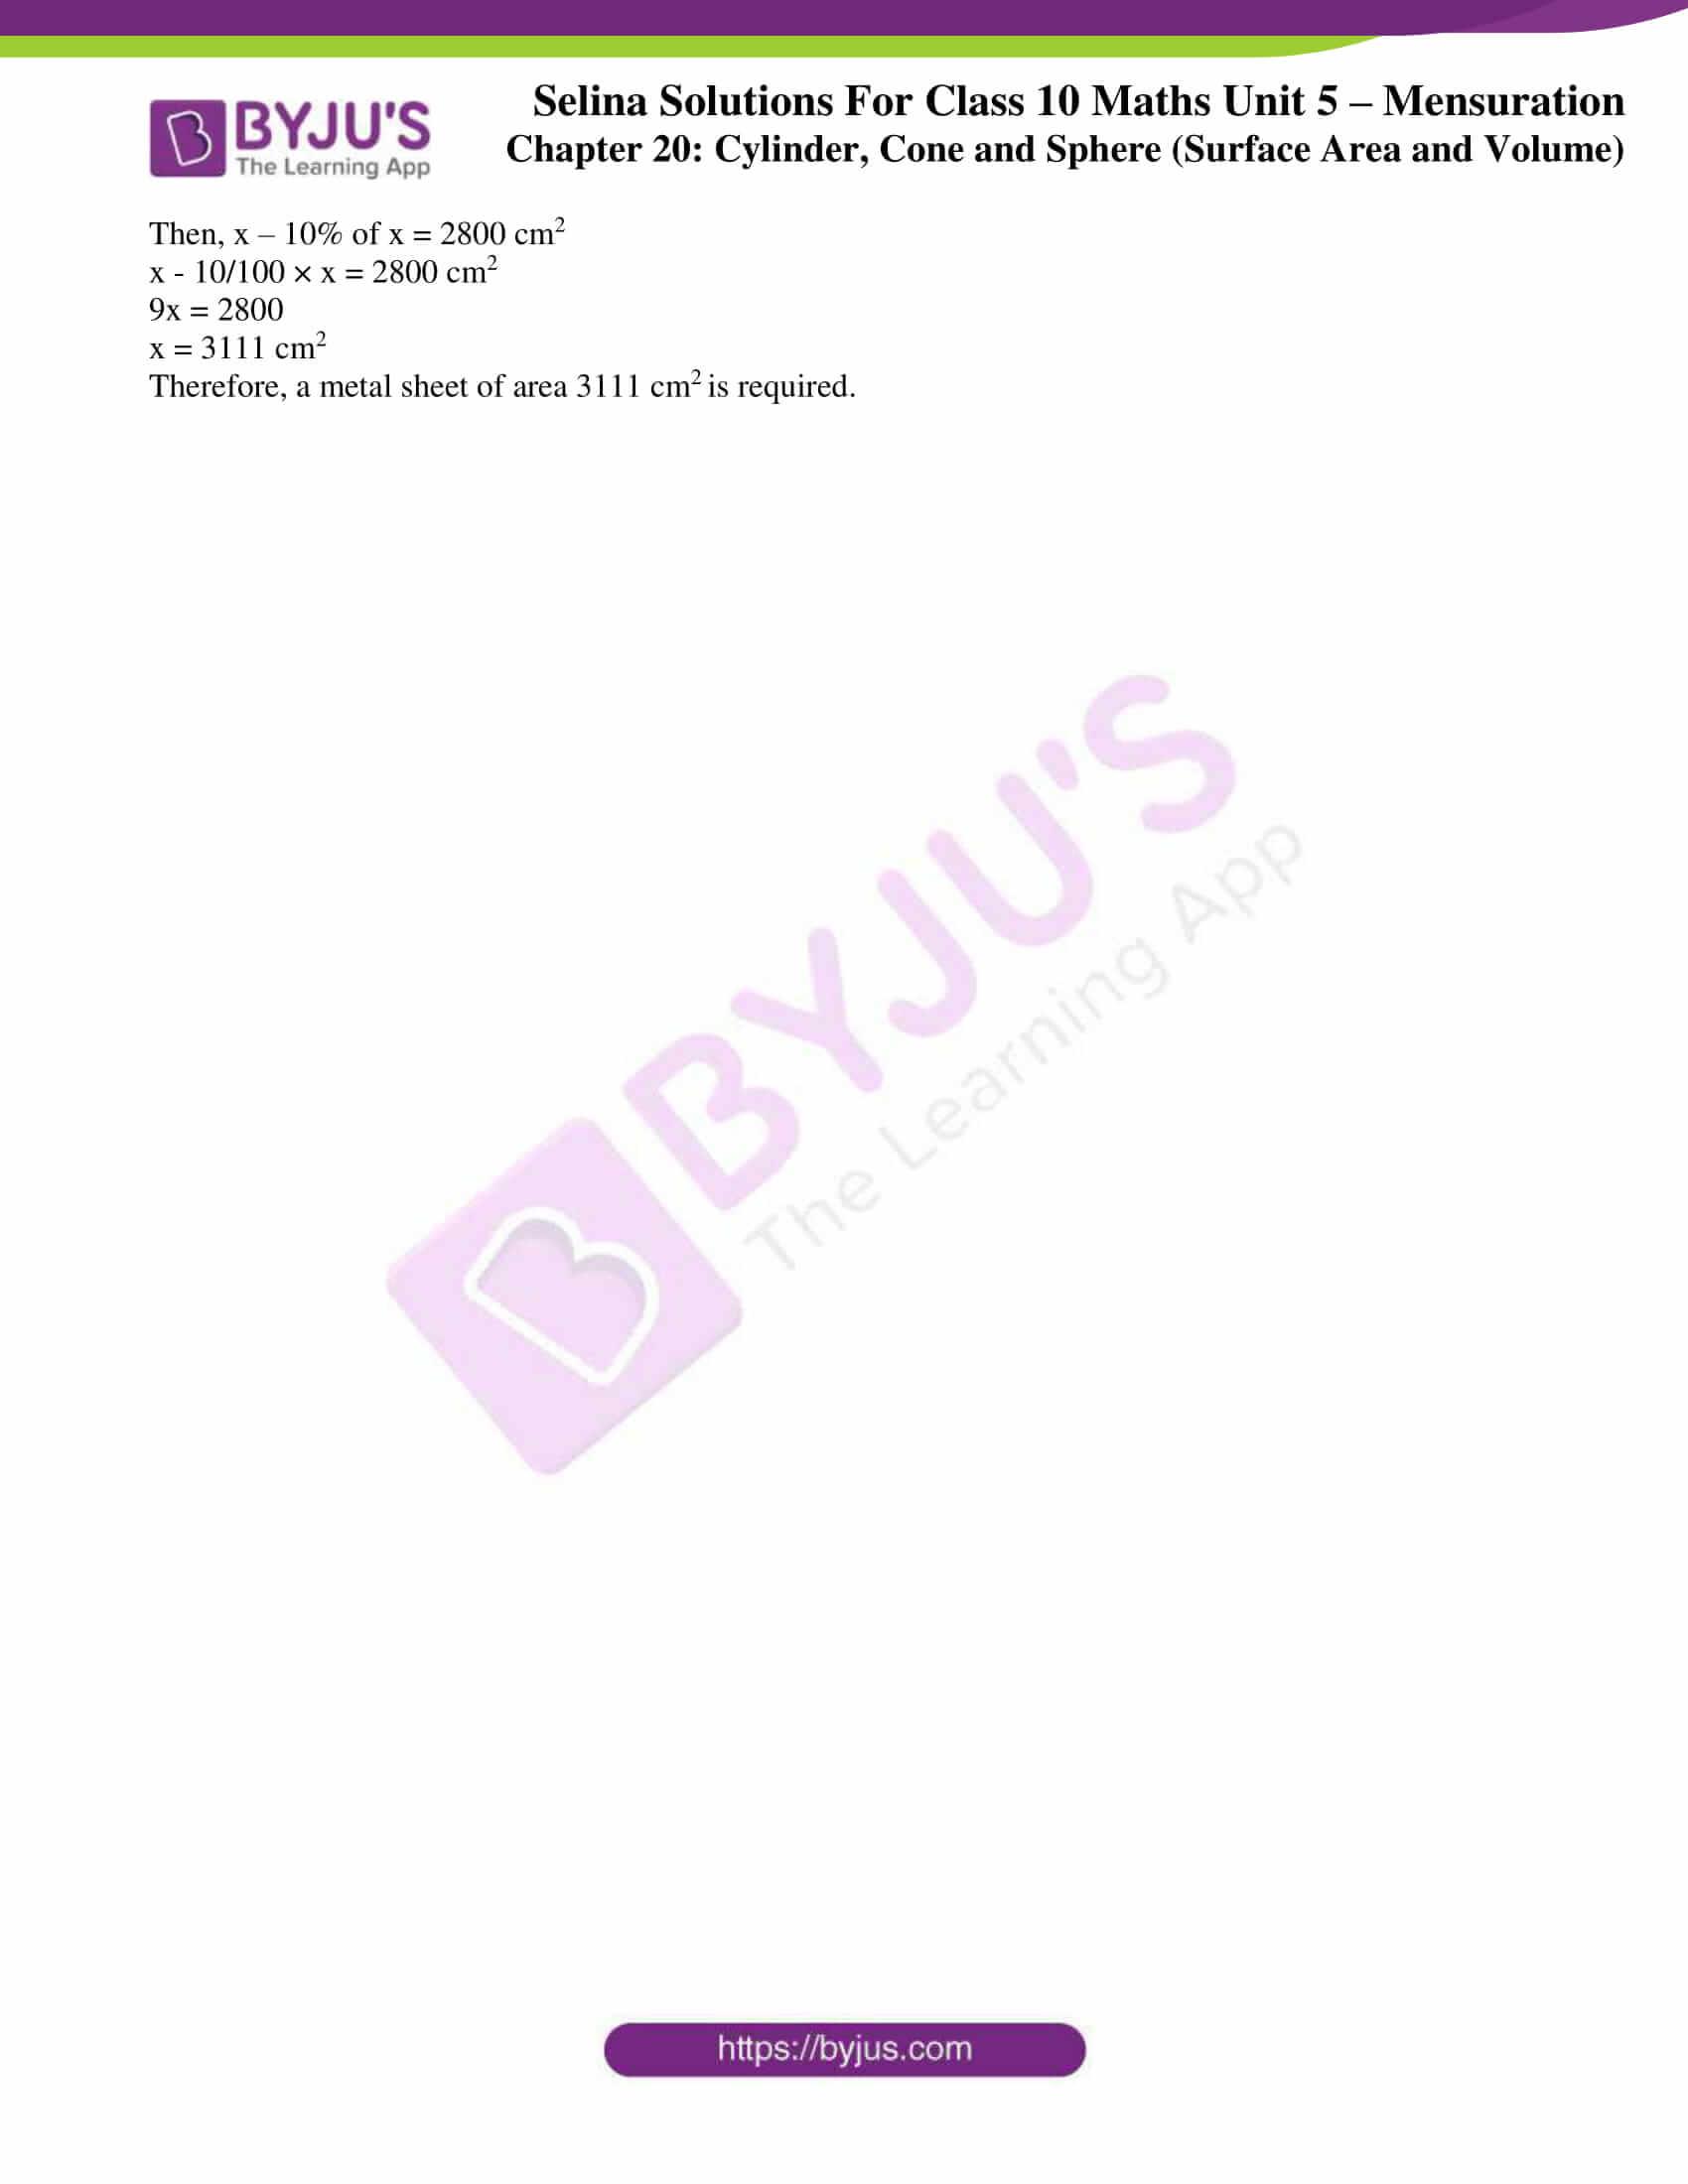 selina-sol-maths-class-10-ch-20-ex-a-7